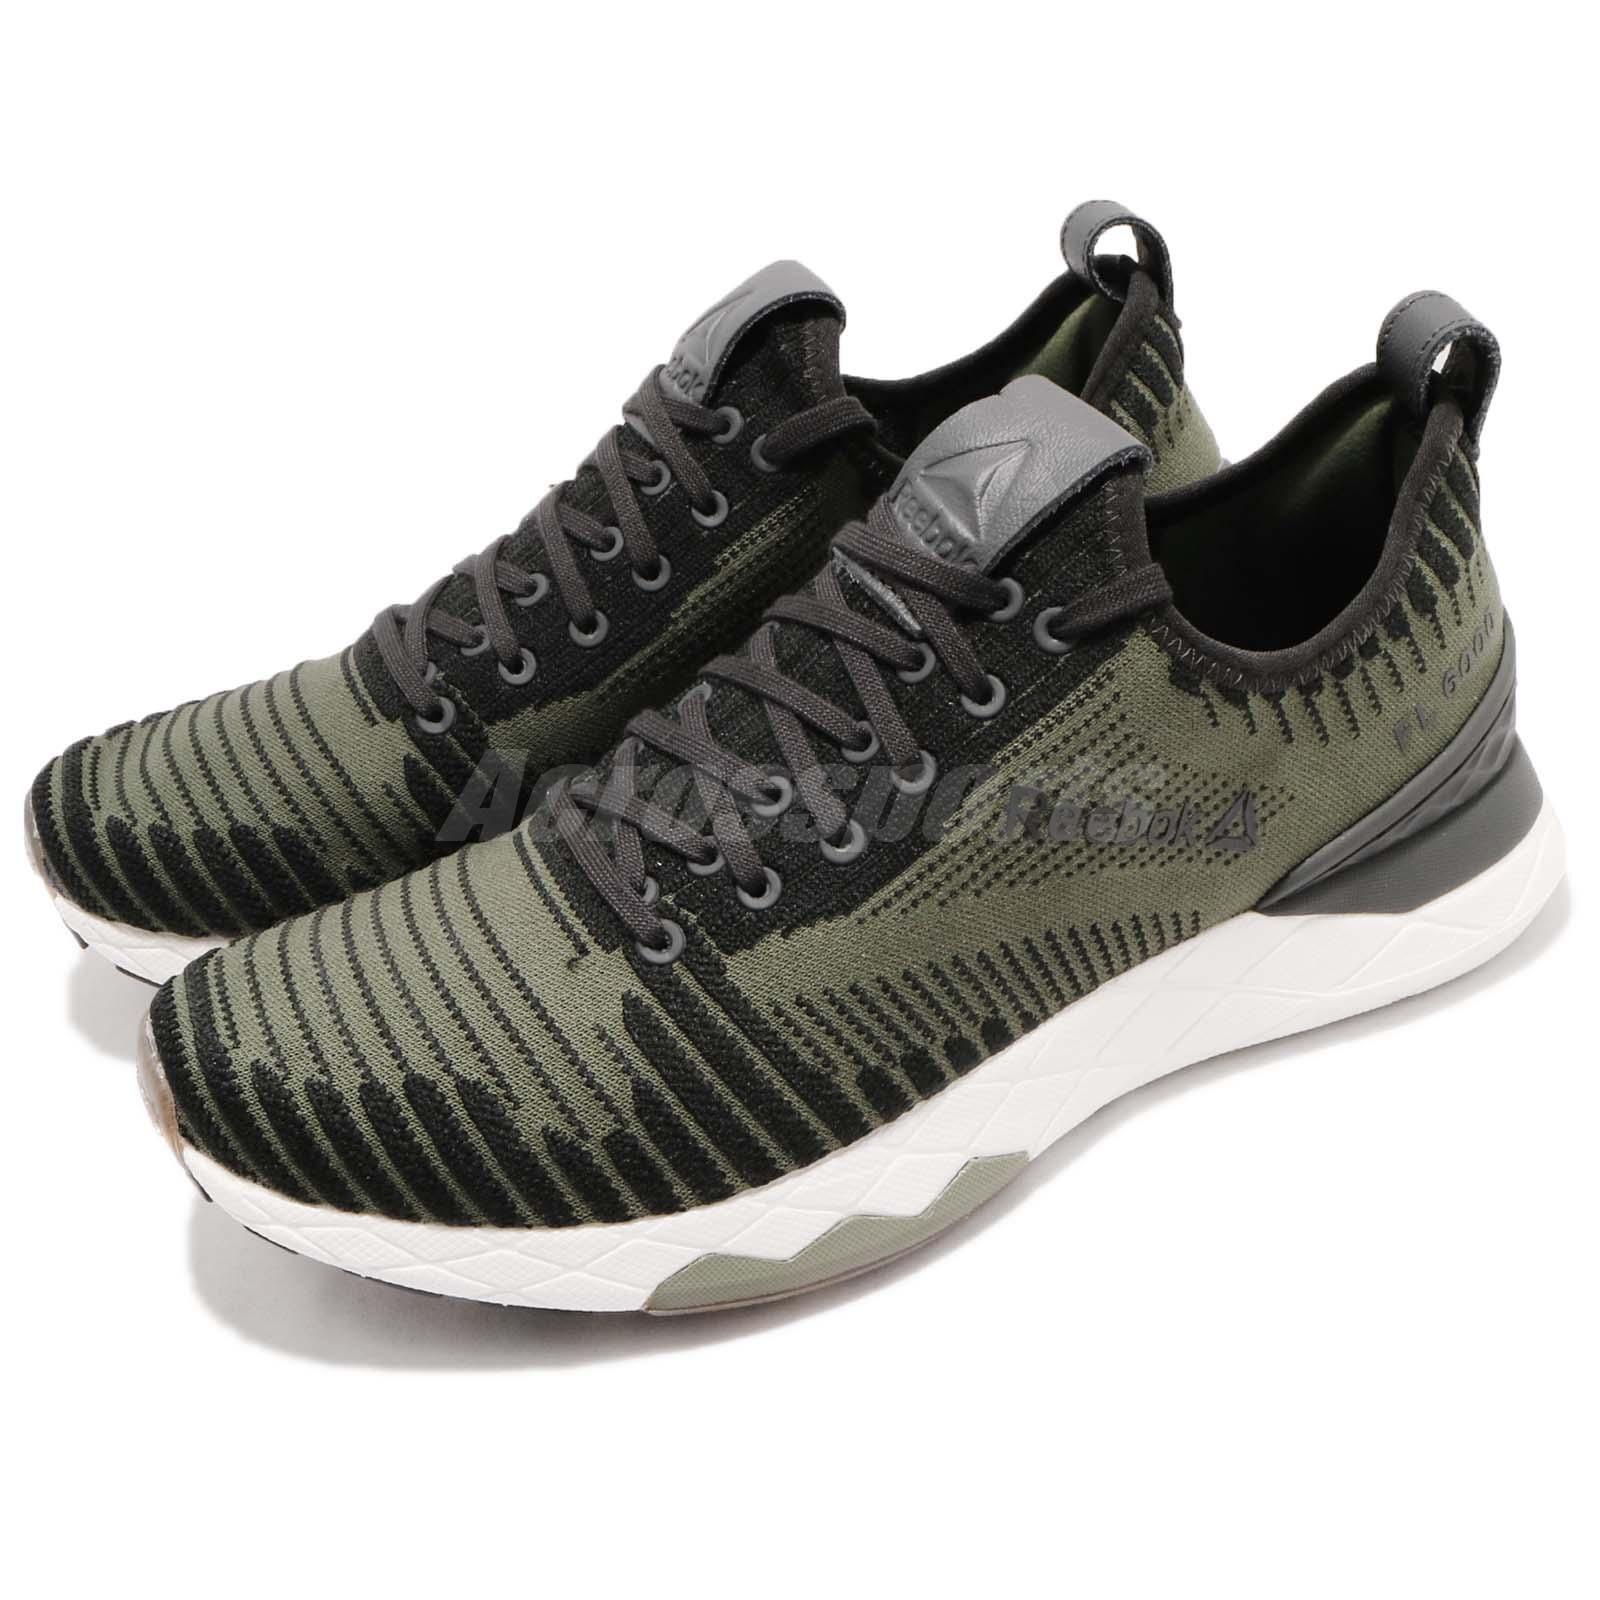 Reebok Floatride Floatride Floatride 6000 Ultraknit Hunter verde nero bianca Men Running scarpe CN2231 | Superficie facile da pulire  0e6779